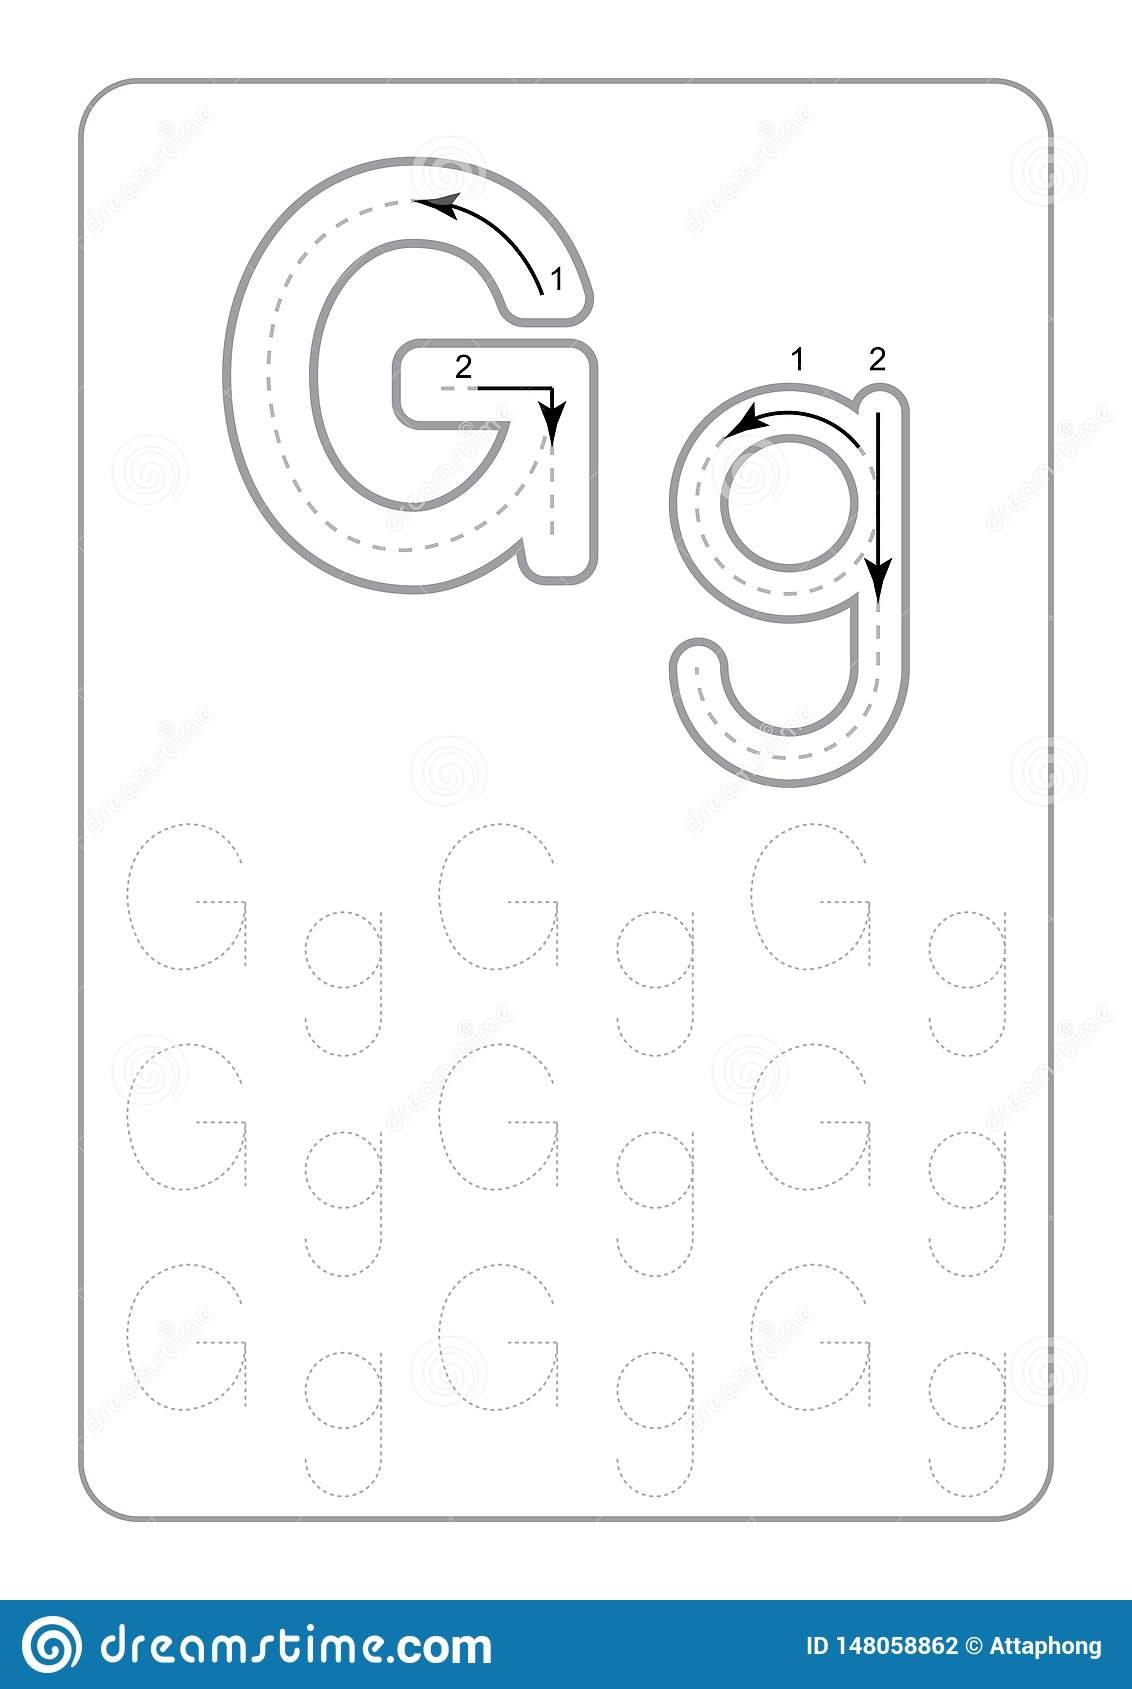 Kindergarten Tracing Letters Worksheets Monochrome Tracing pertaining to Kindergarten Tracing Letters